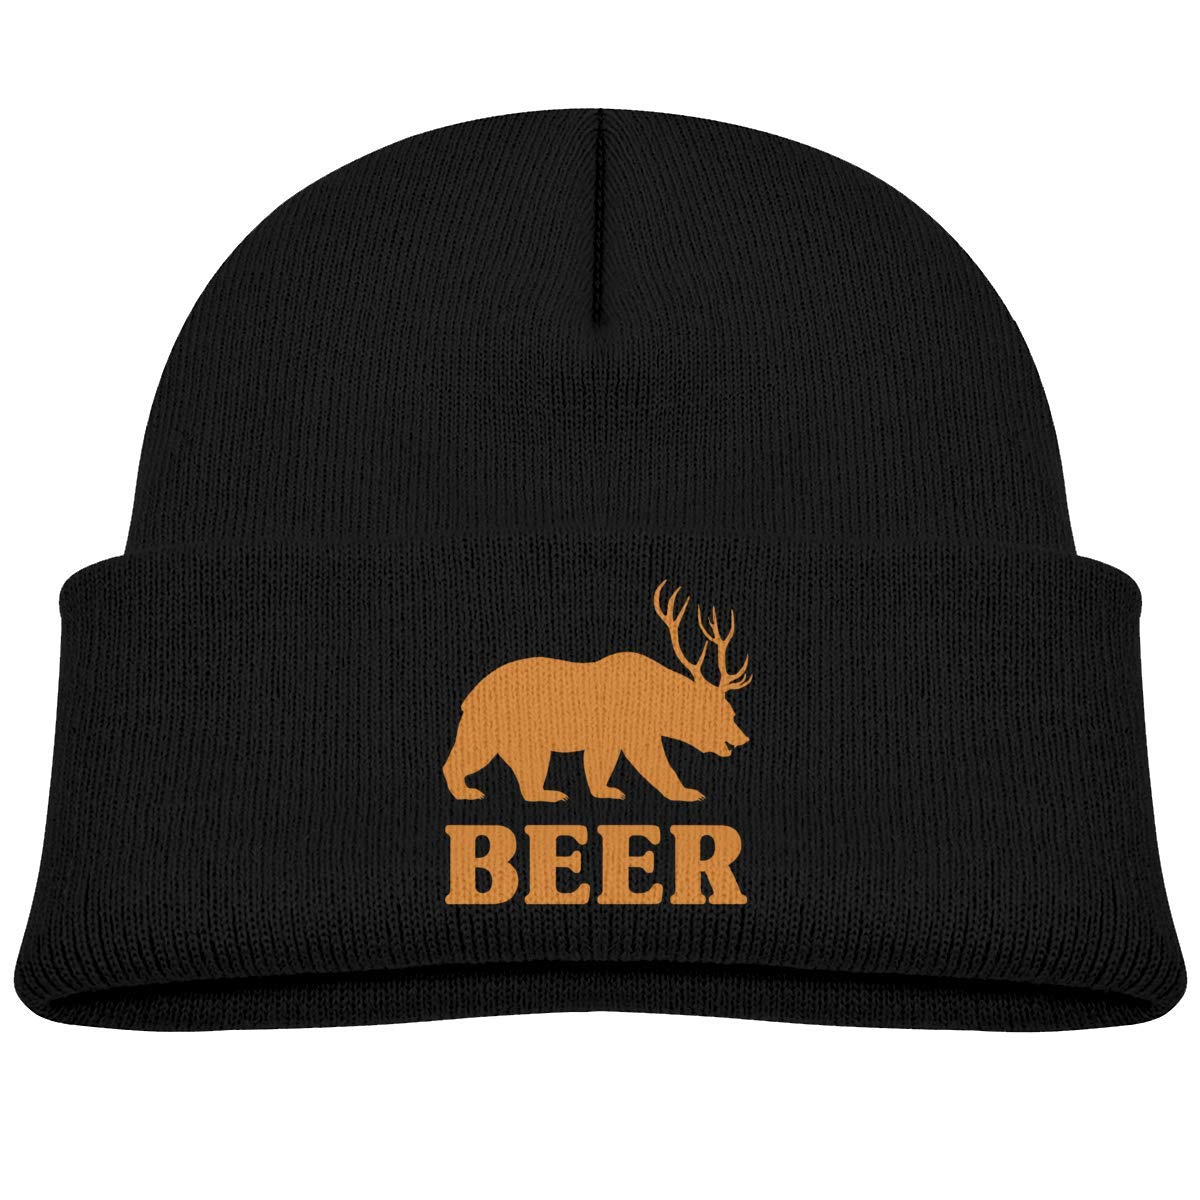 lightwek Beer Bear Deer Skull Hats Baby Girls